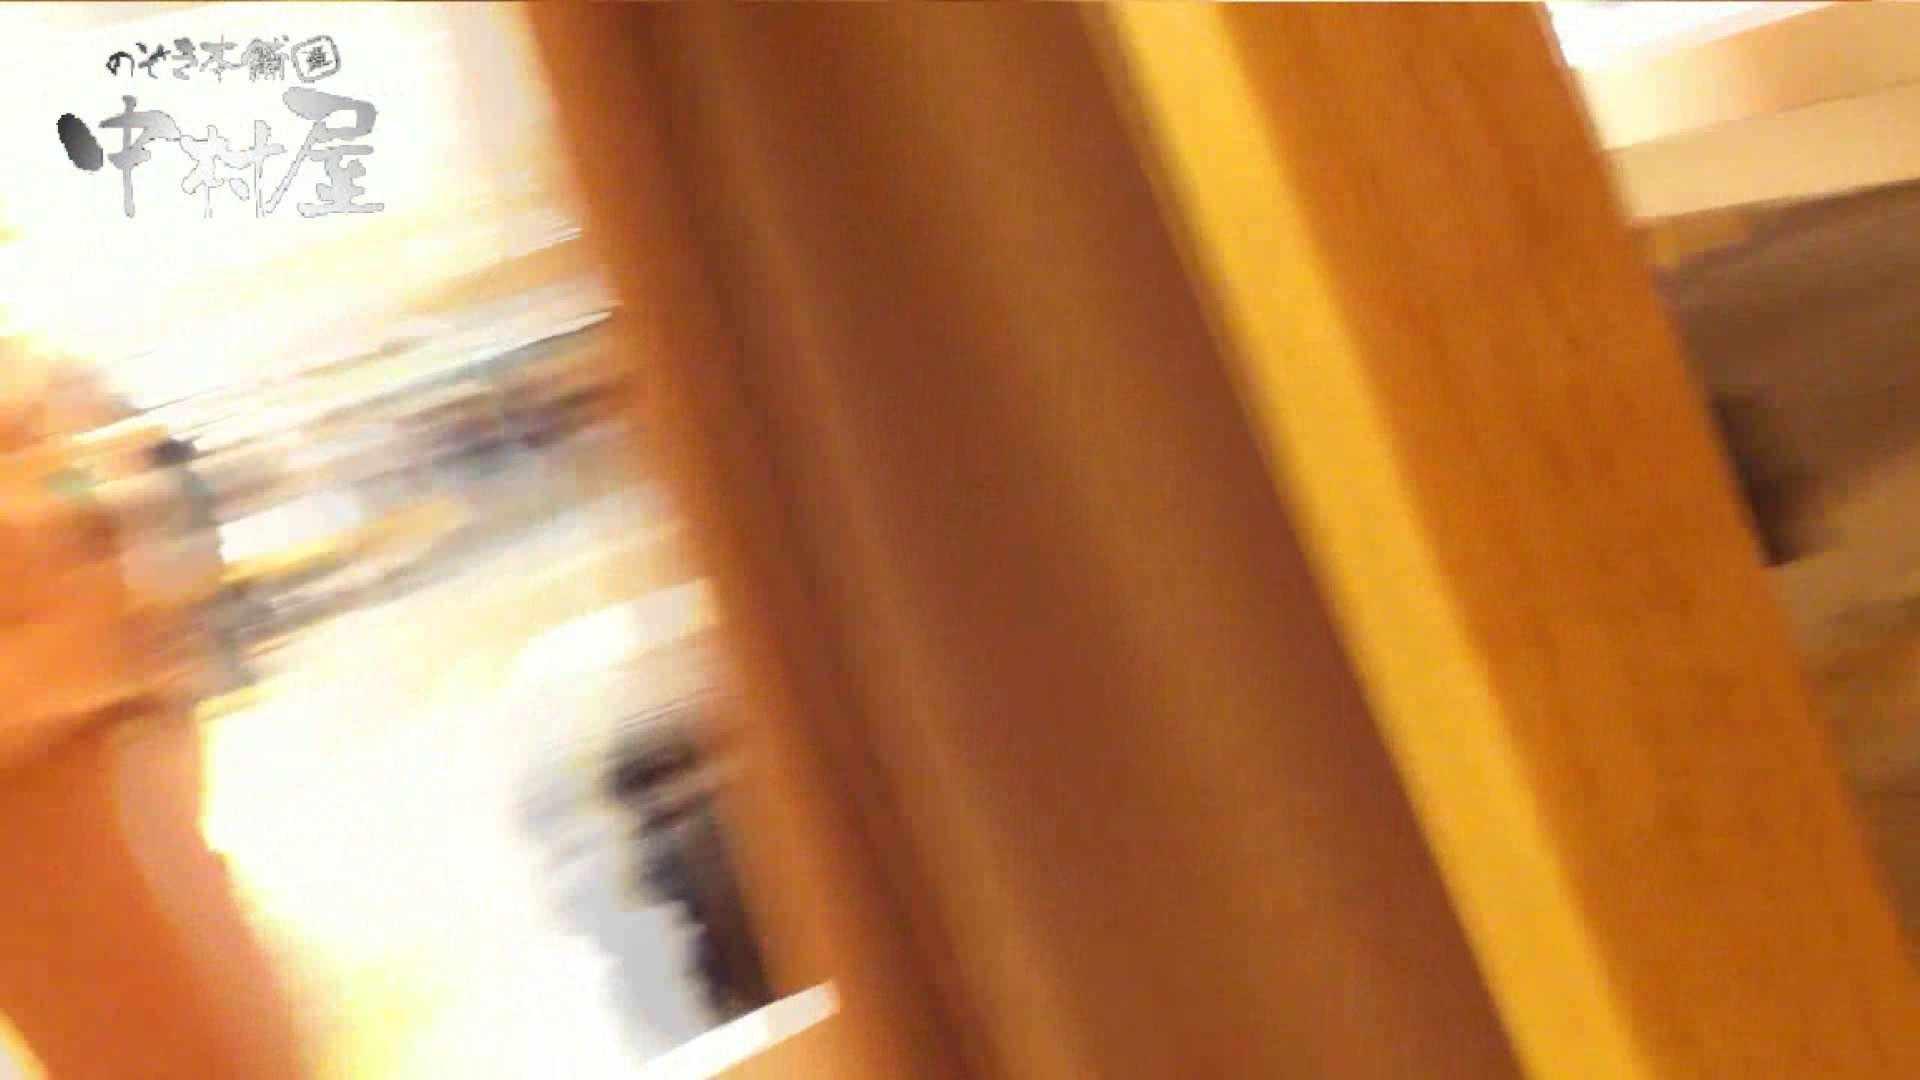 vol.48可愛いカリスマ店員胸チラ&パンチラ アニメ声の店員さん パンチラ | チラ  110画像 6